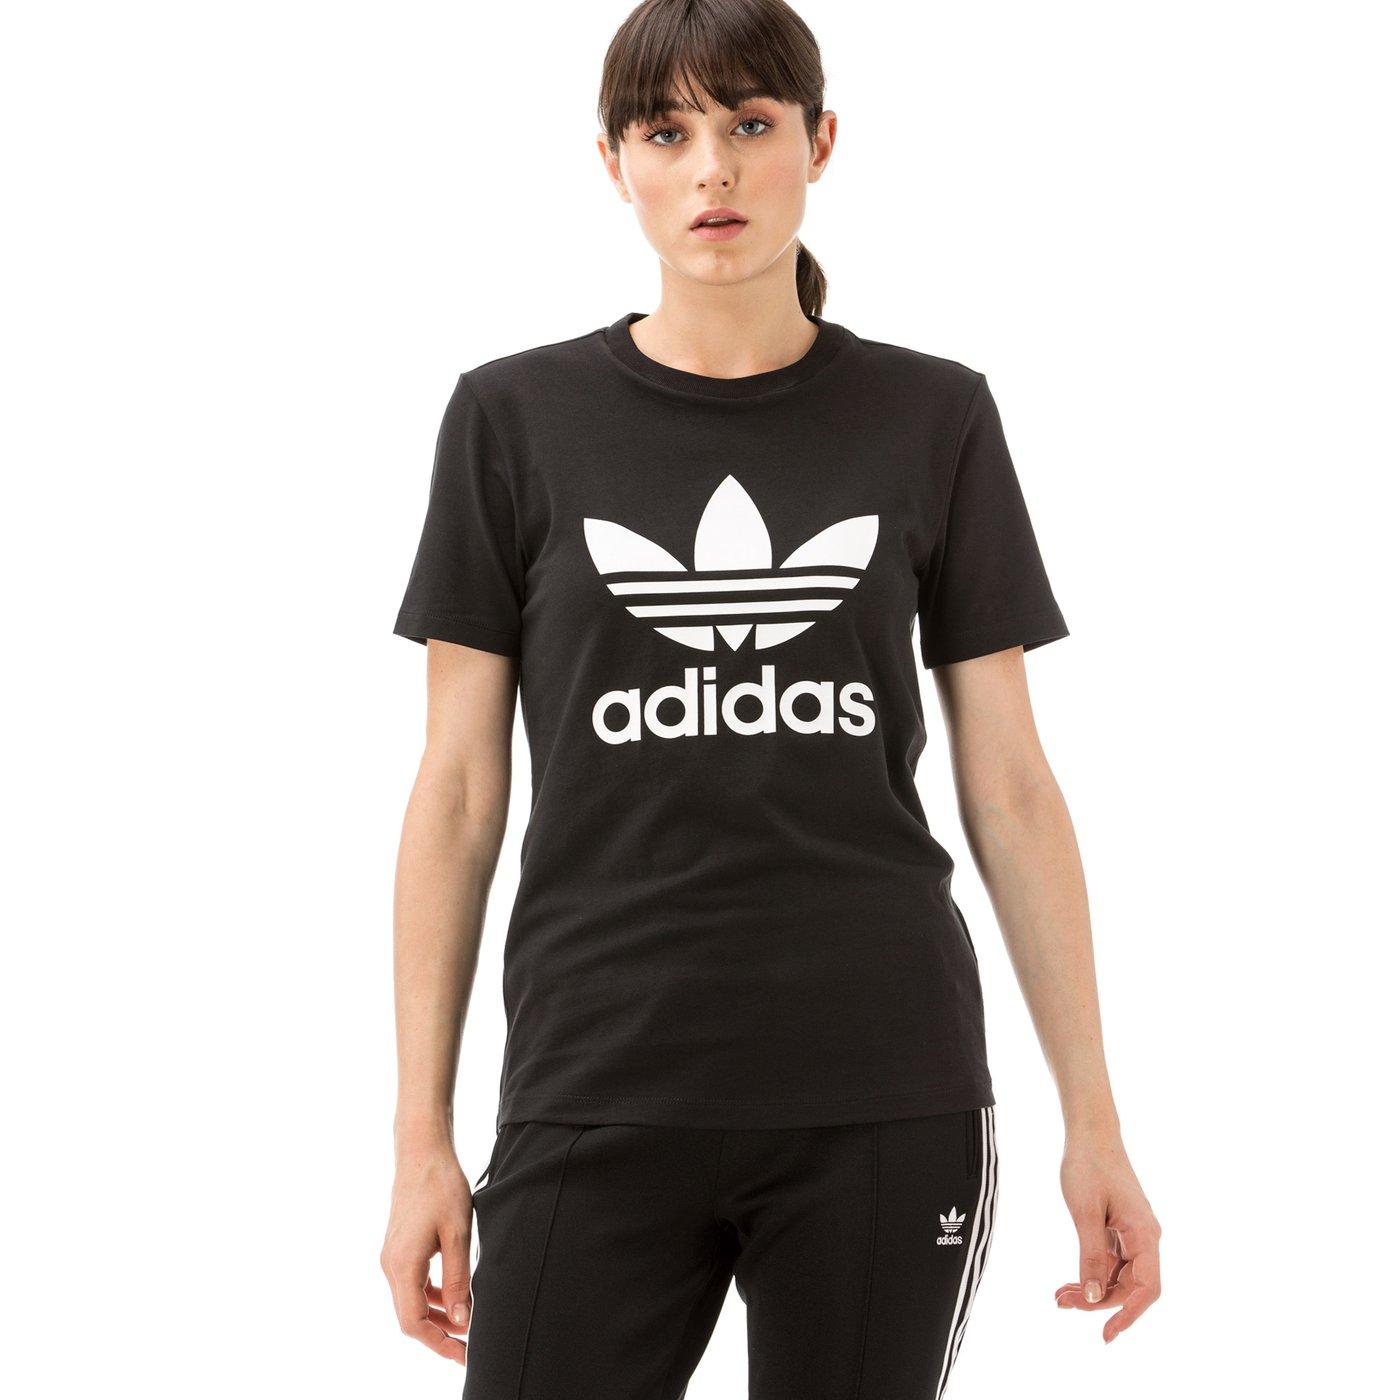 adidas Trefoil Tee Kadın Siyah T-Shirt